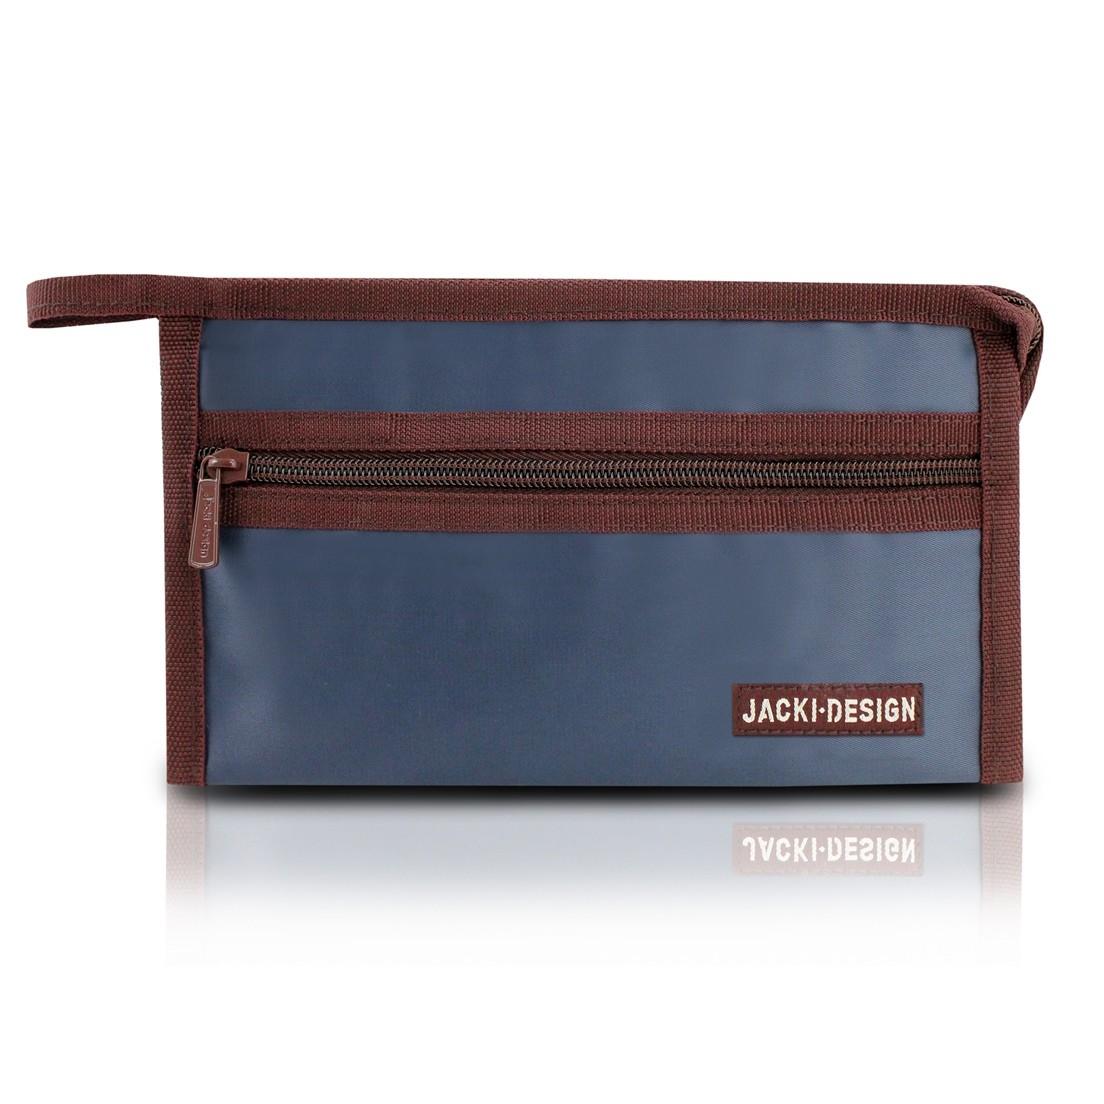 Necessaire Envelope Lisa Essencial III Jacki Design